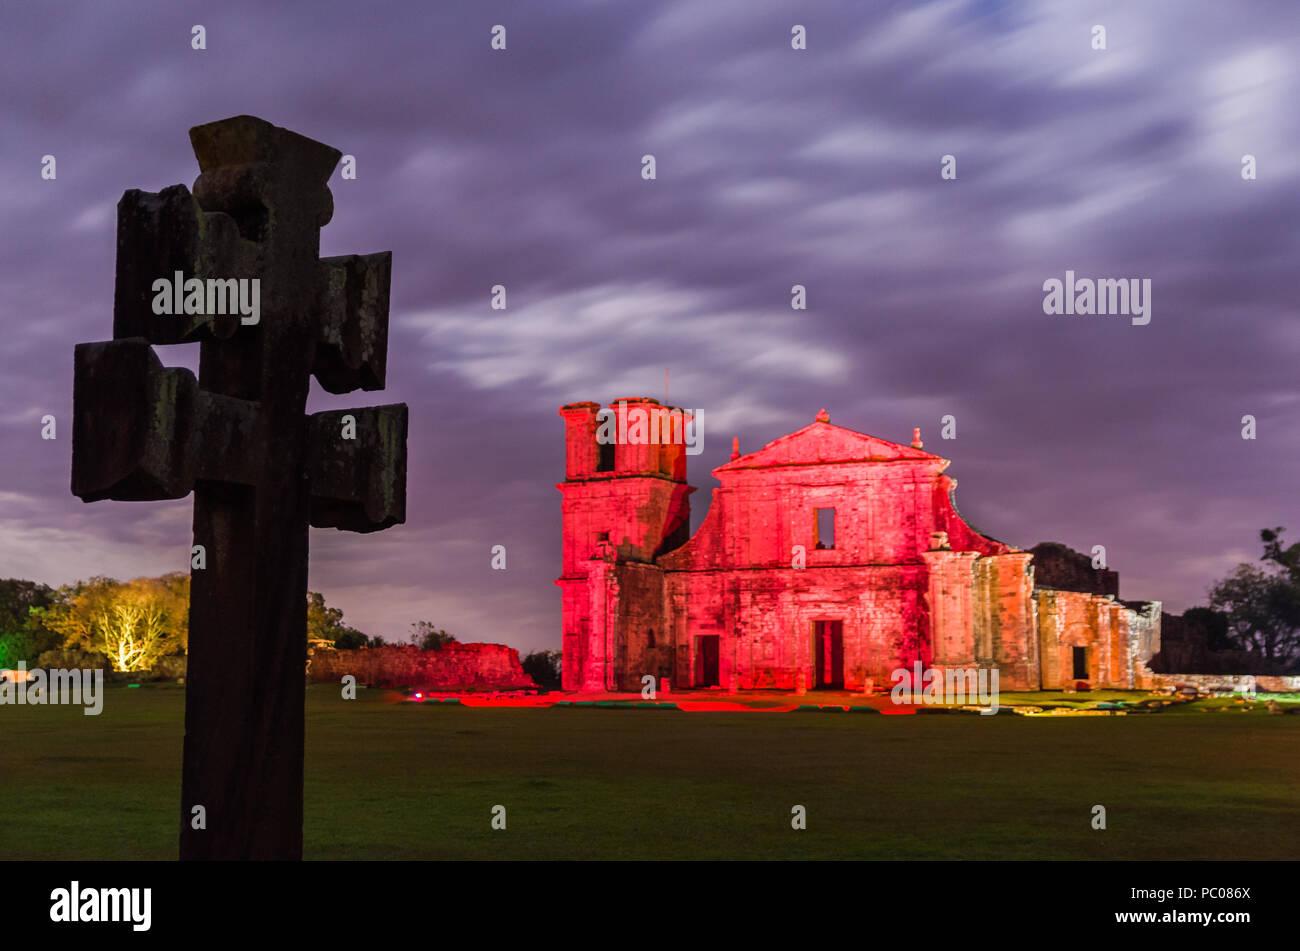 Part of the UNESCO site - Jesuit Missions of the Guaranis: Church, Ruins of Sao Miguel das Missoe, Rio Grande do Sul, Brazil. Stock Photo